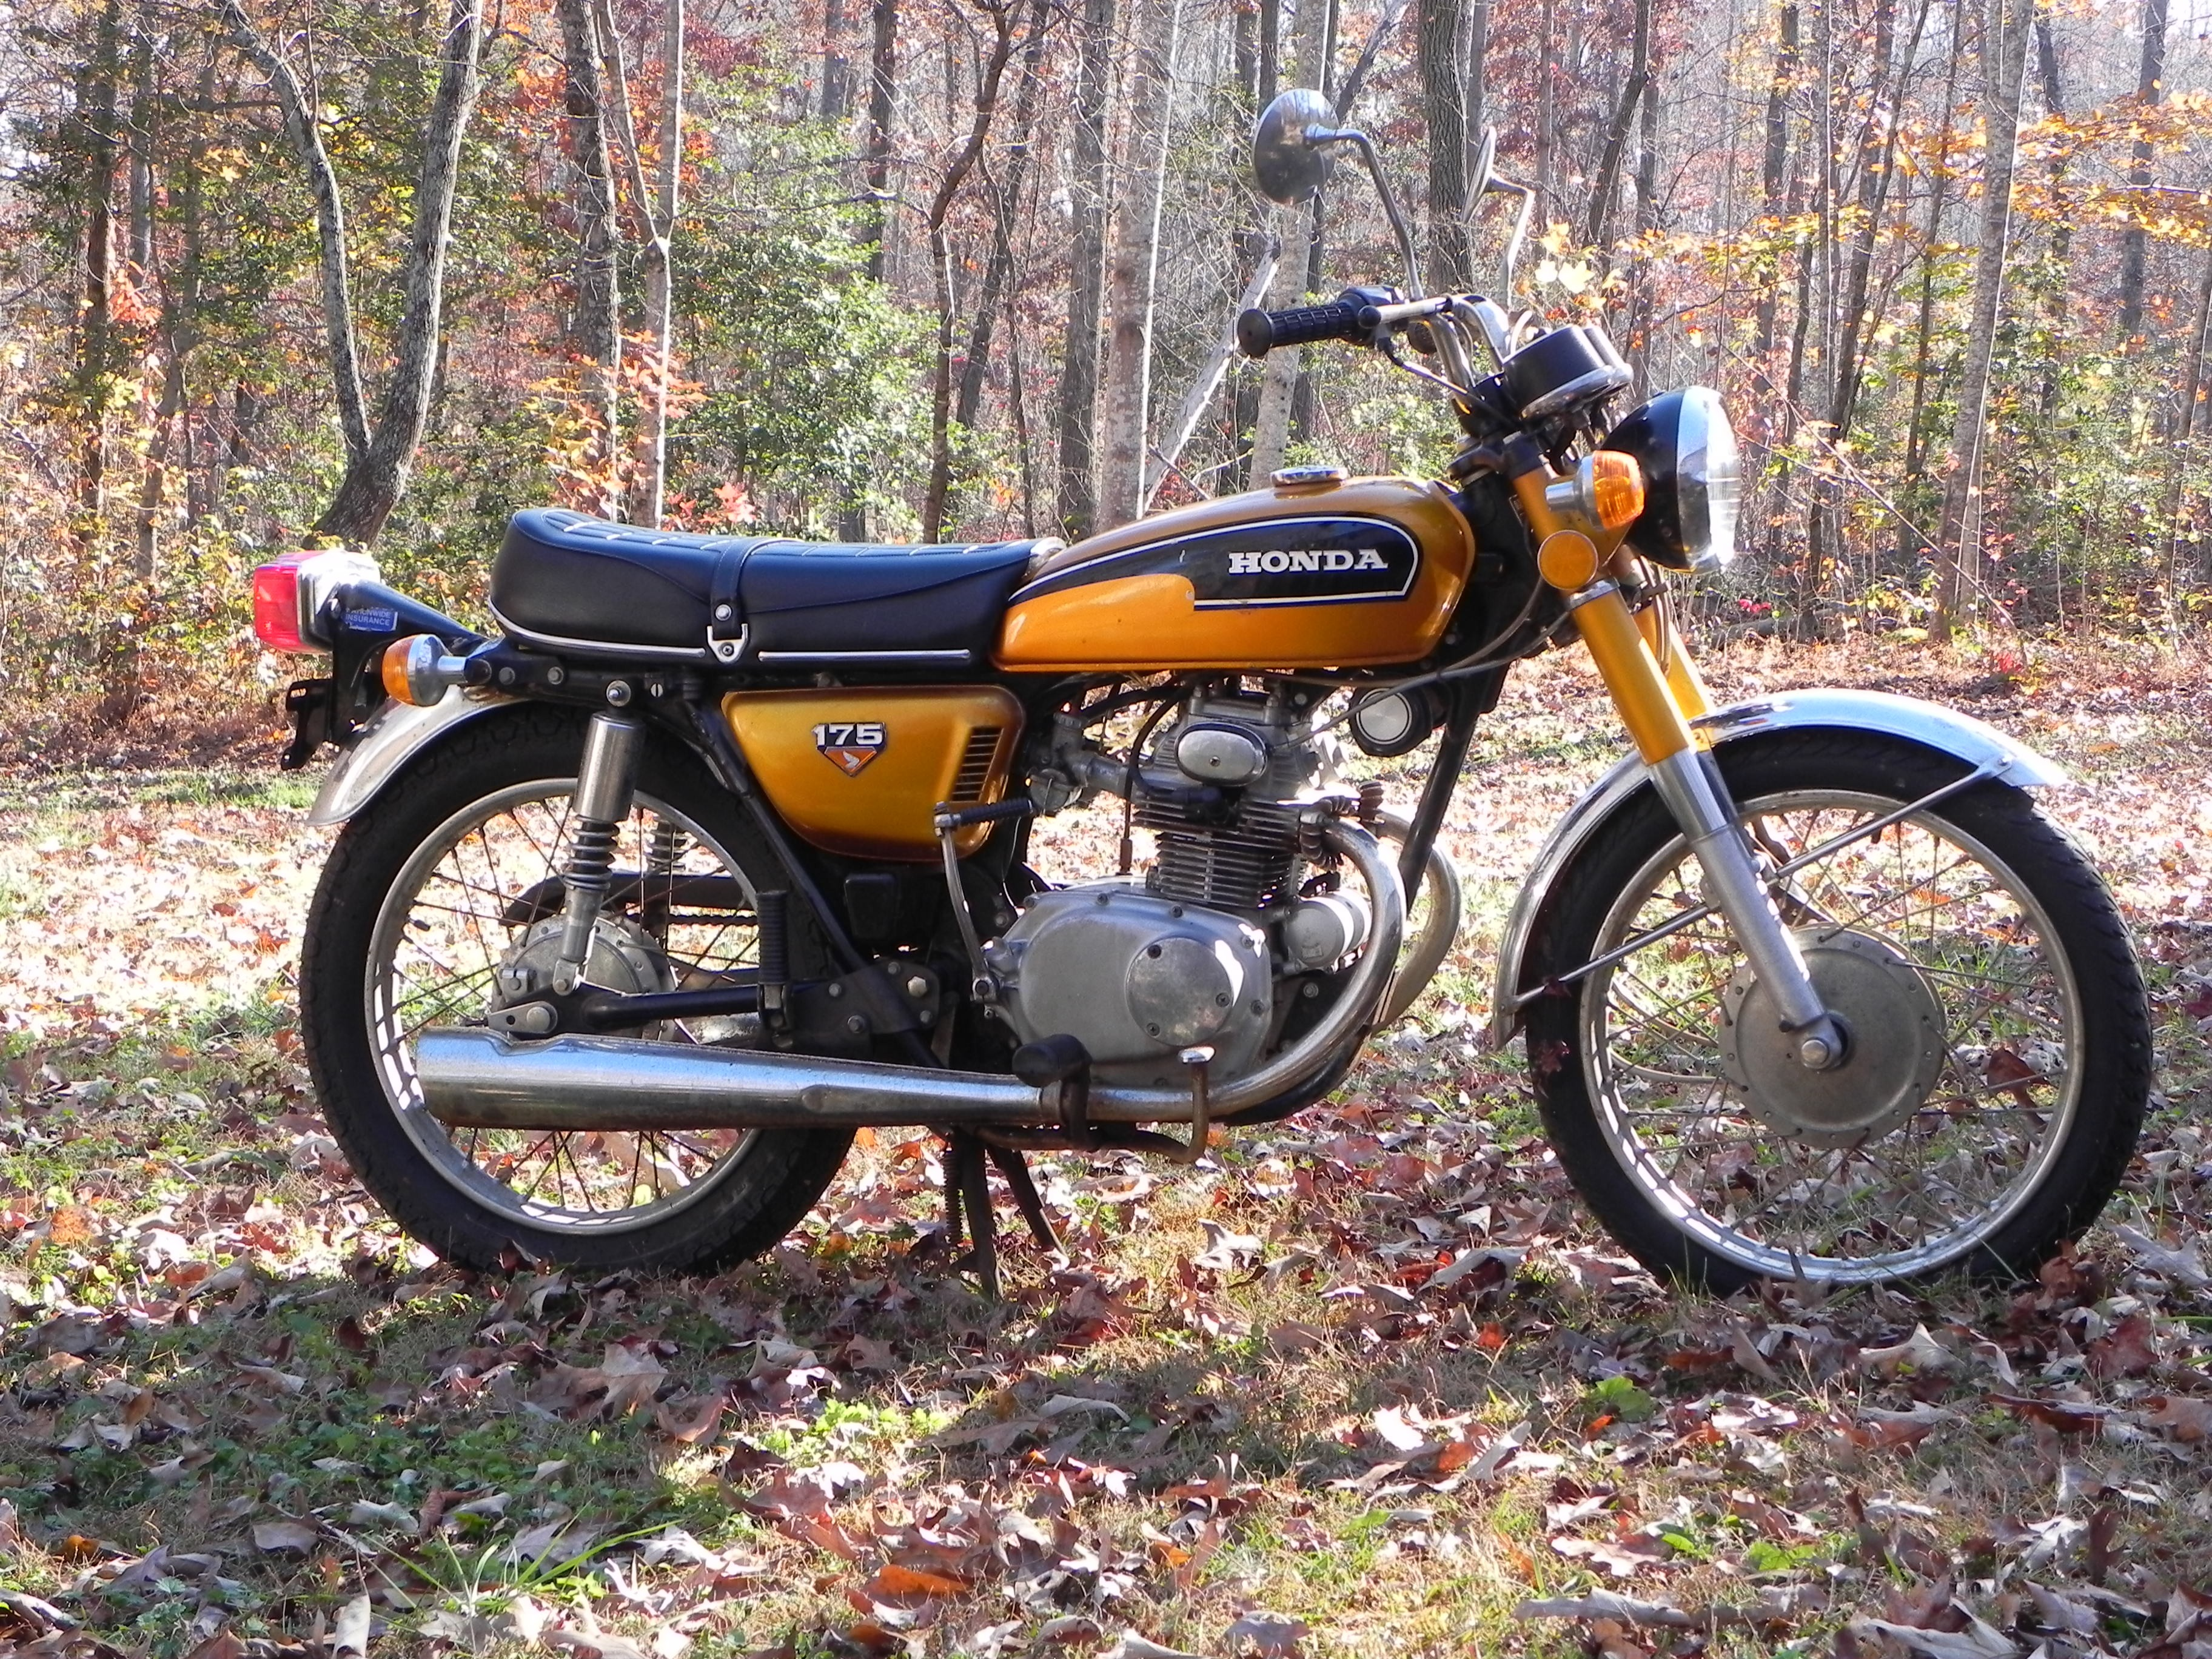 Wiring Harness Diagram For A Suzuki Gs750 in addition Honda Tl125 Wiring Diagram additionally 1970 Nc50 Wiring Diagram besides Triumph Motorcycle Wiring Diagram together with Wiring Diagram Suzuki Rv 90. on honda mt125 wiring diagram